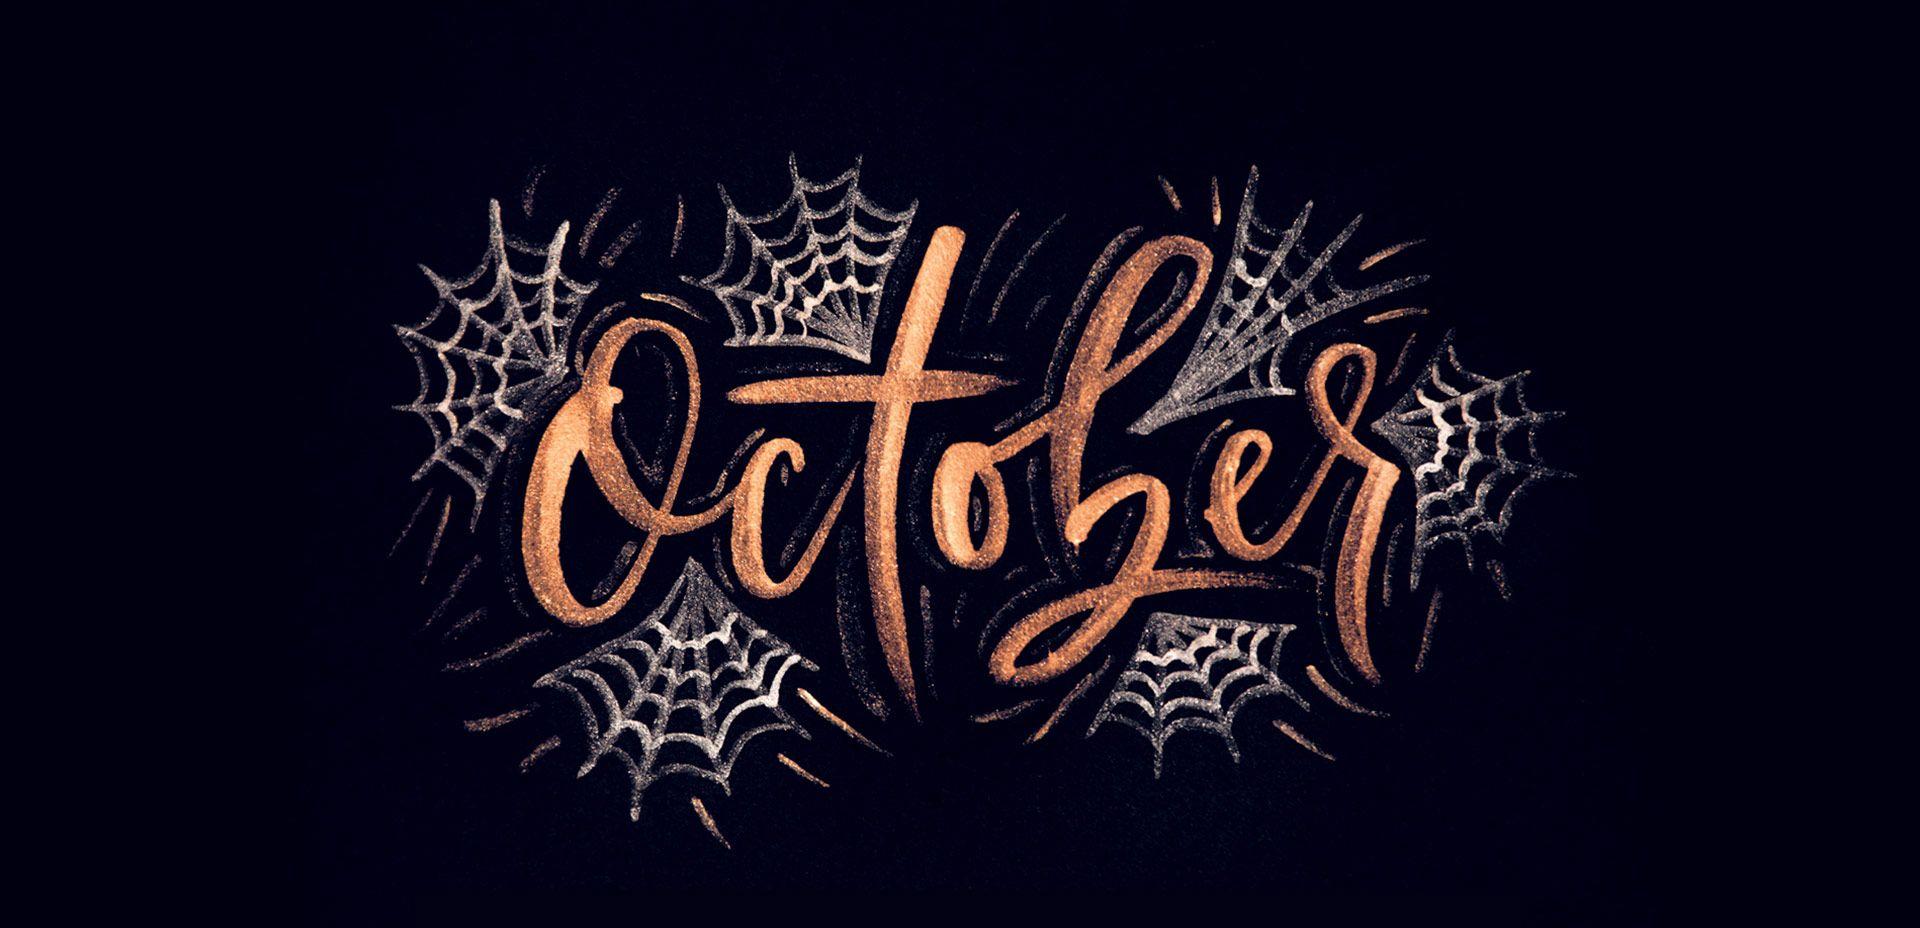 Aesthetic Halloween Wallpaper For Computer